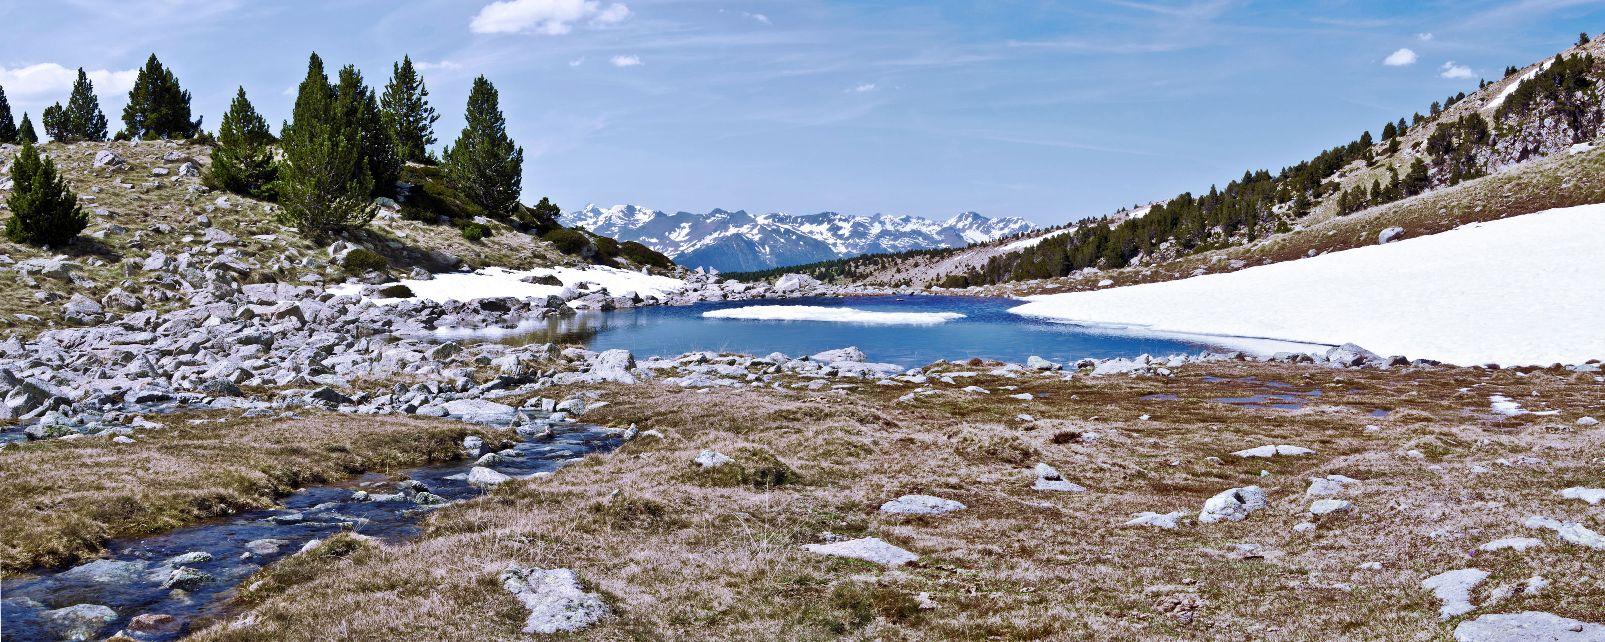 La vallée du Madriu , La vallée glaciaire du Madriu-Perafita-Claror , Andorre